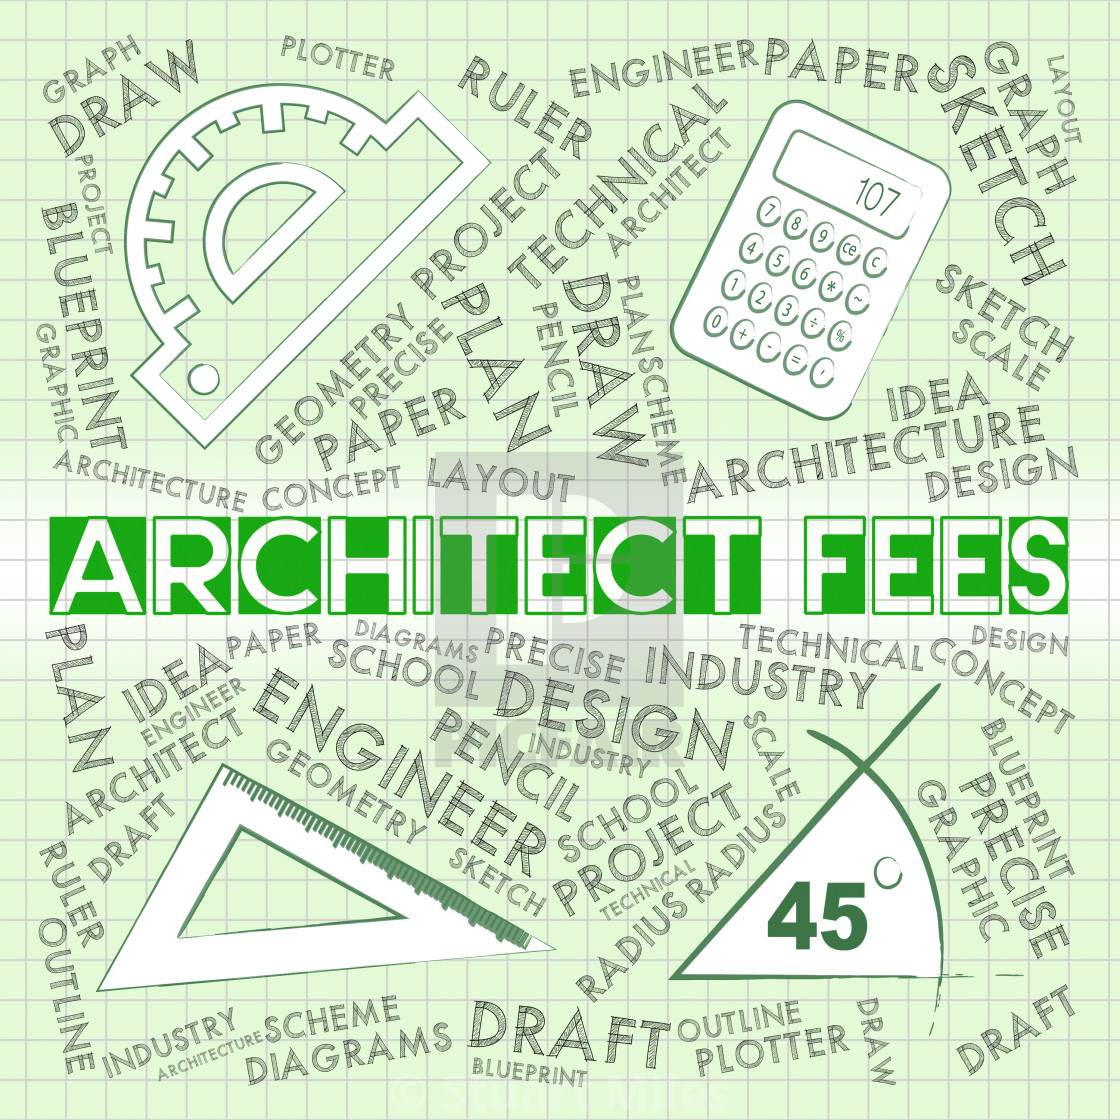 architect-fees